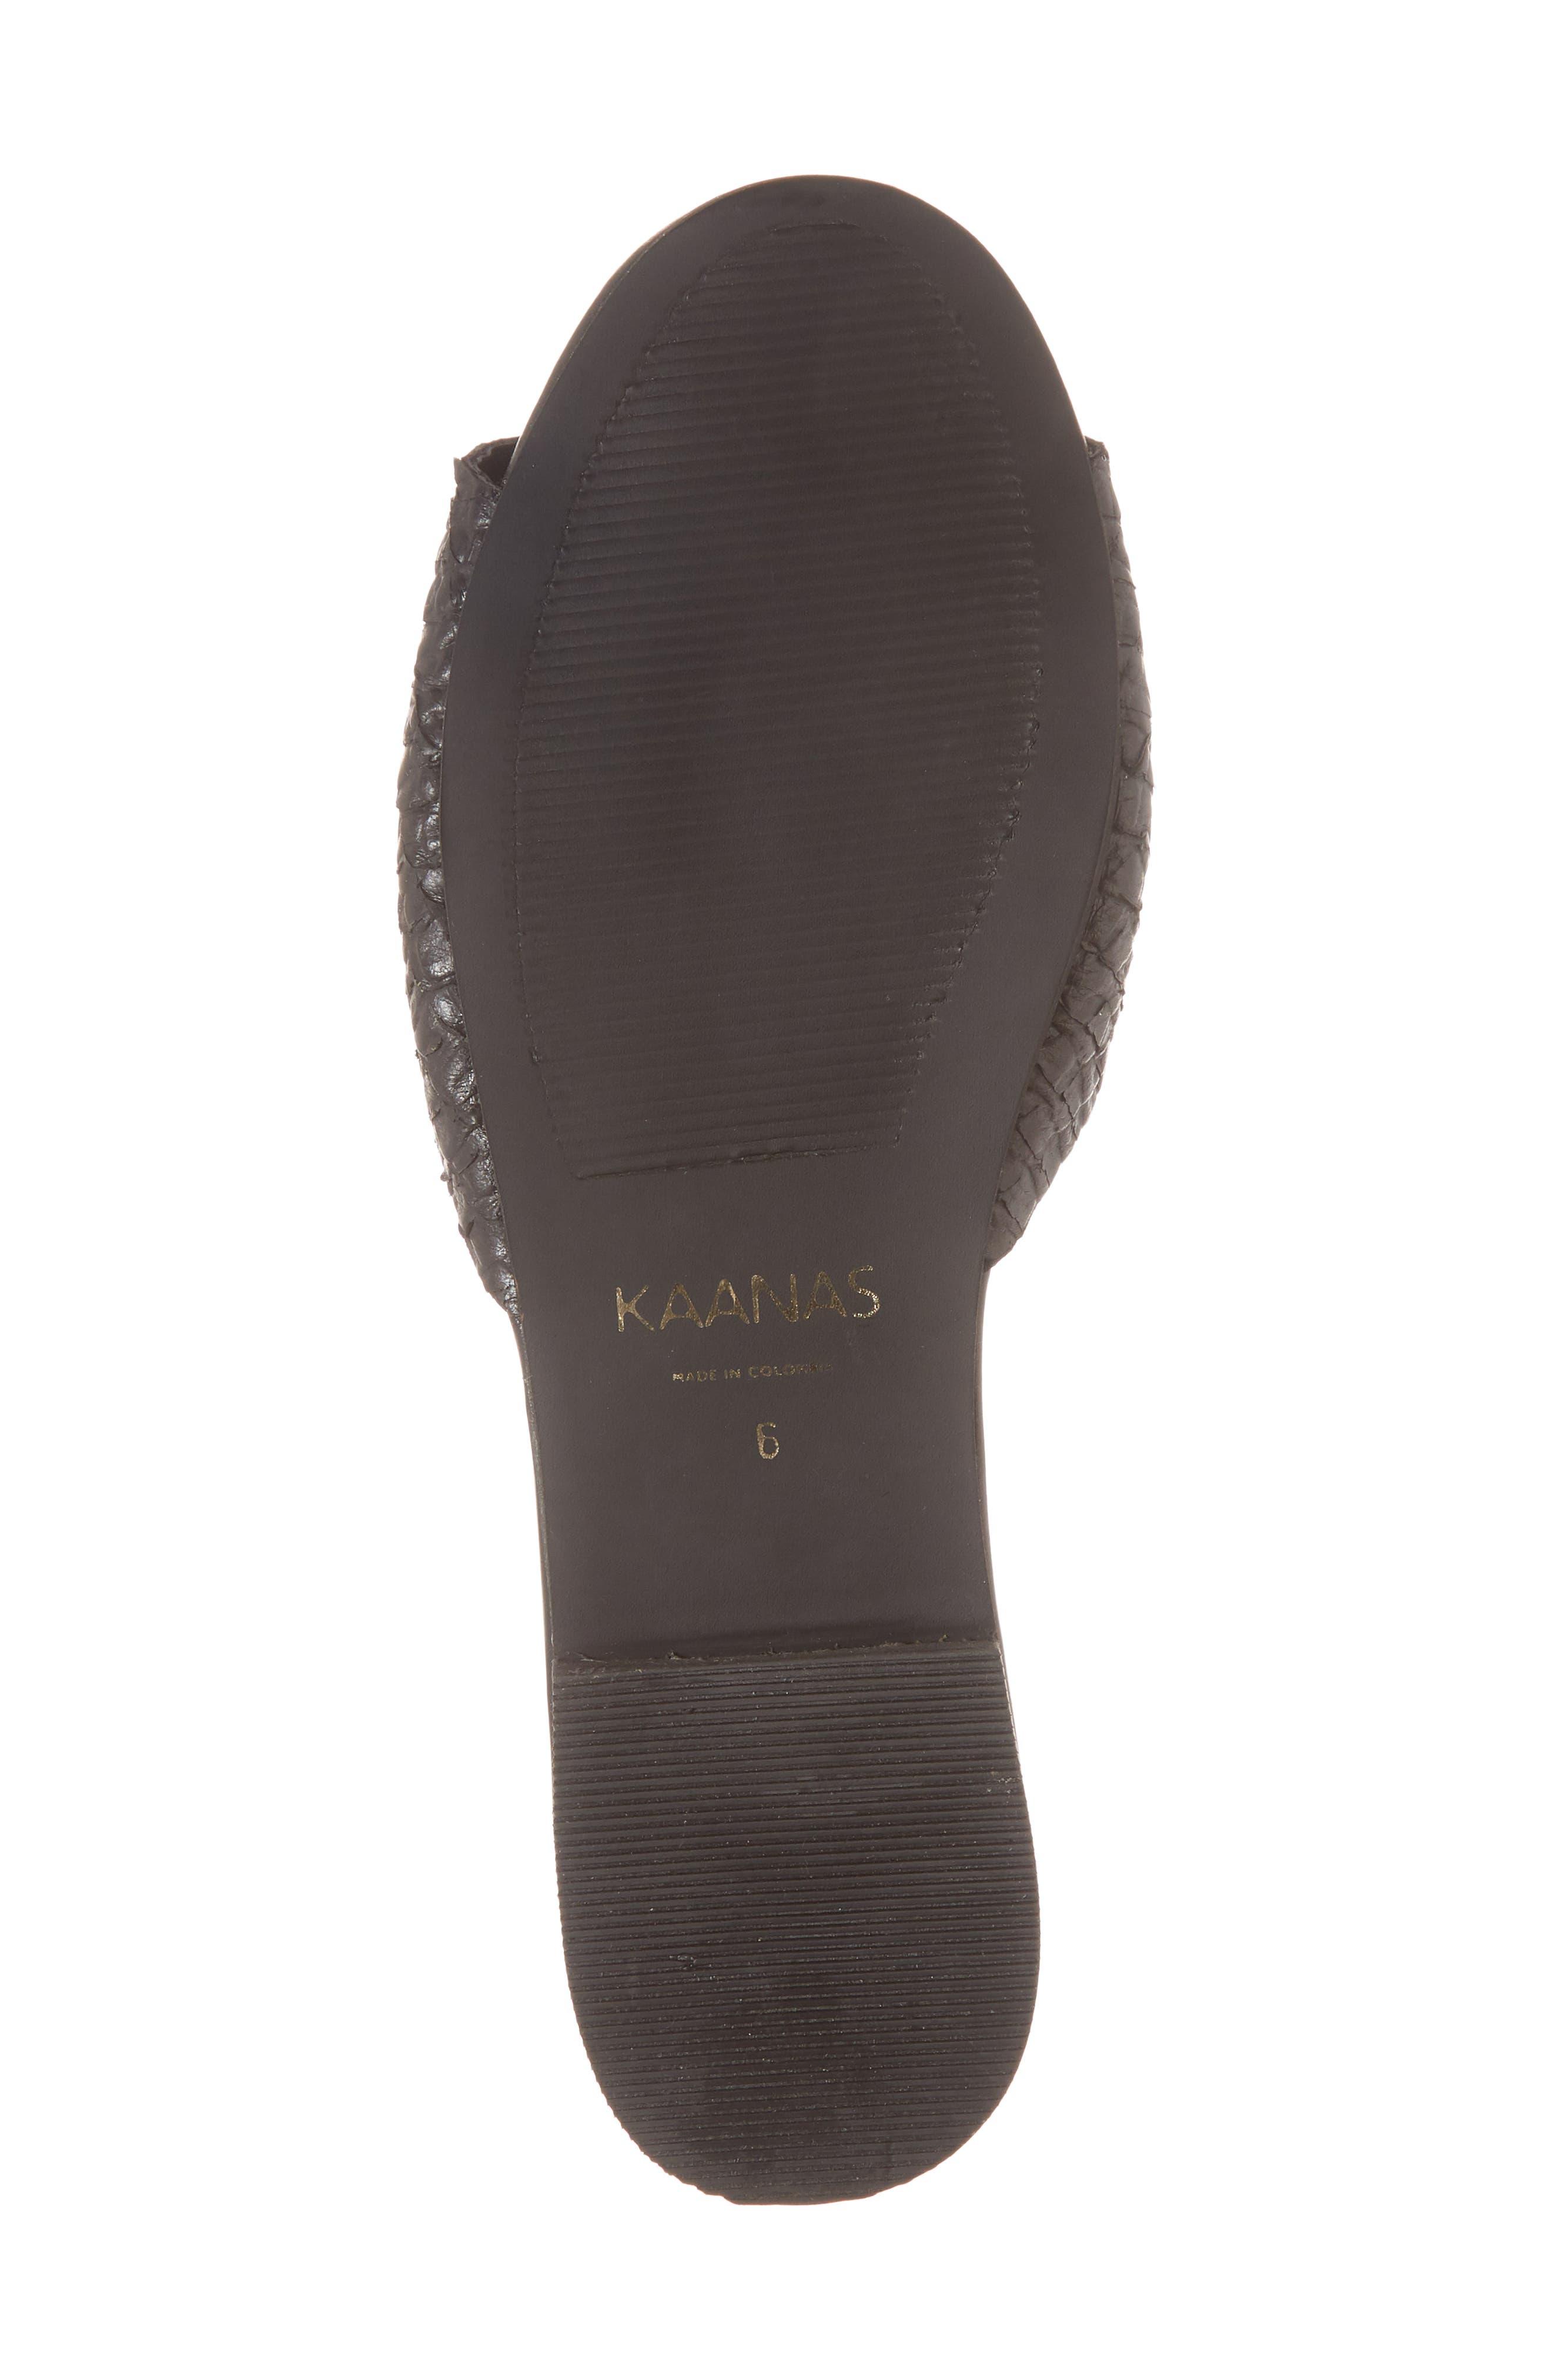 Leticia Loafer Mule Sandal,                             Alternate thumbnail 6, color,                             BLACK